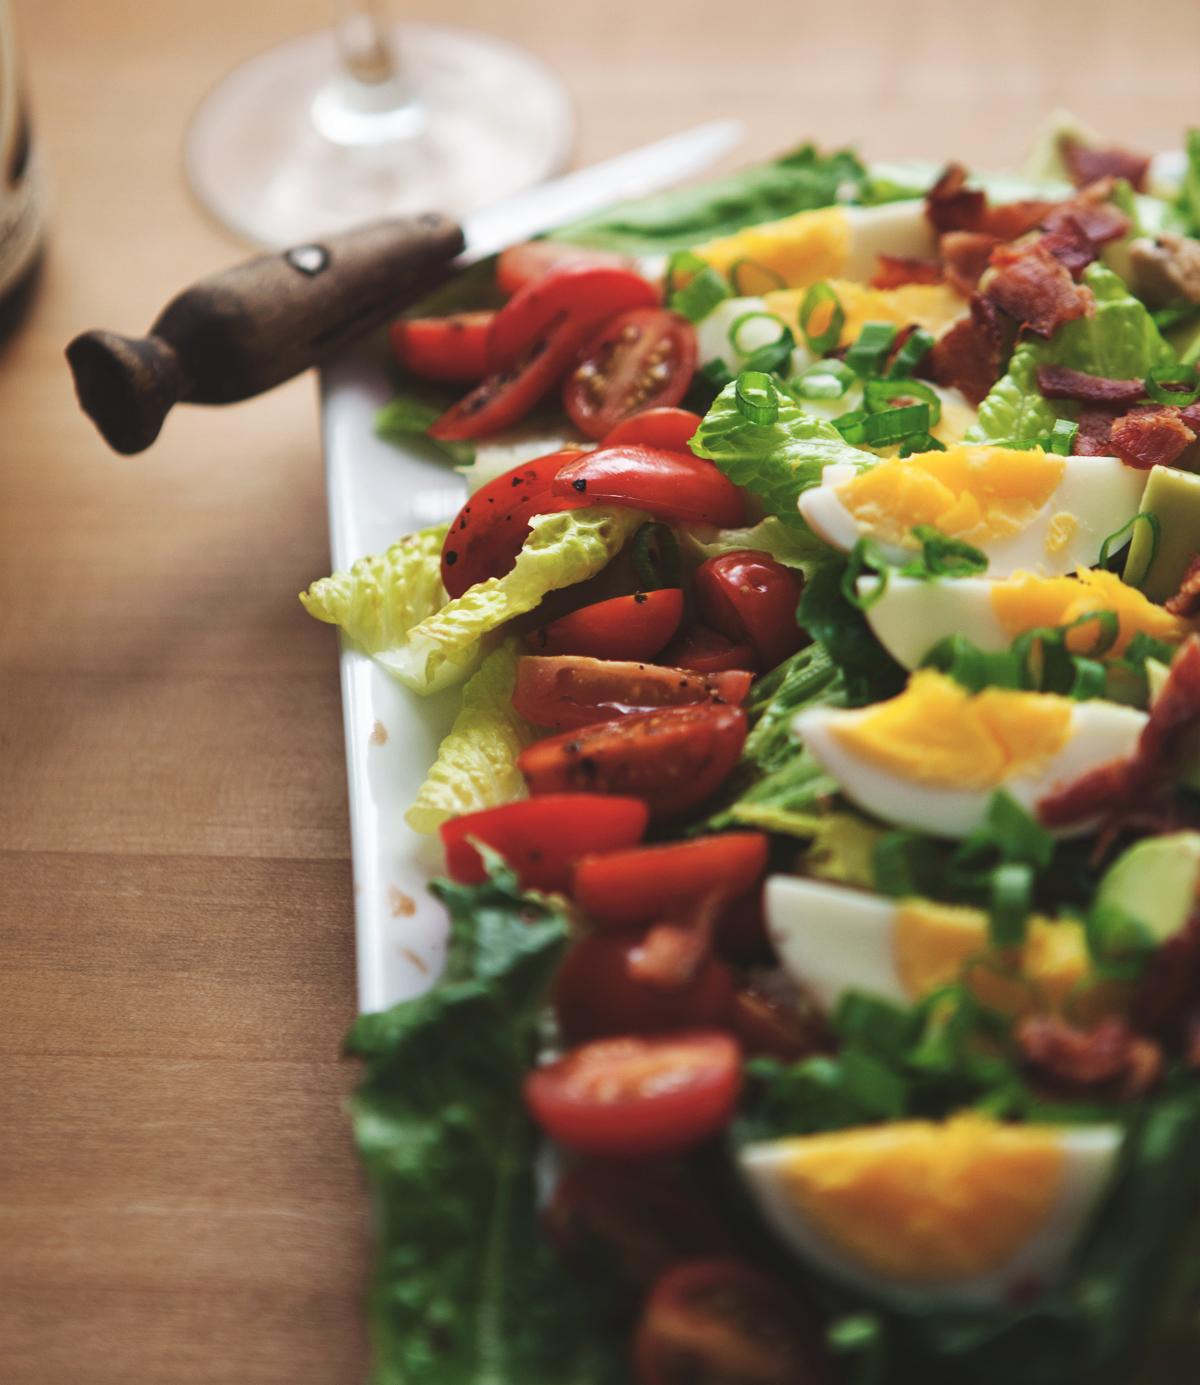 a-Better-Happier-St-Sebastian_Summer-Cobb-Salad-with-Green-Goddess-Dressing_132.jpg